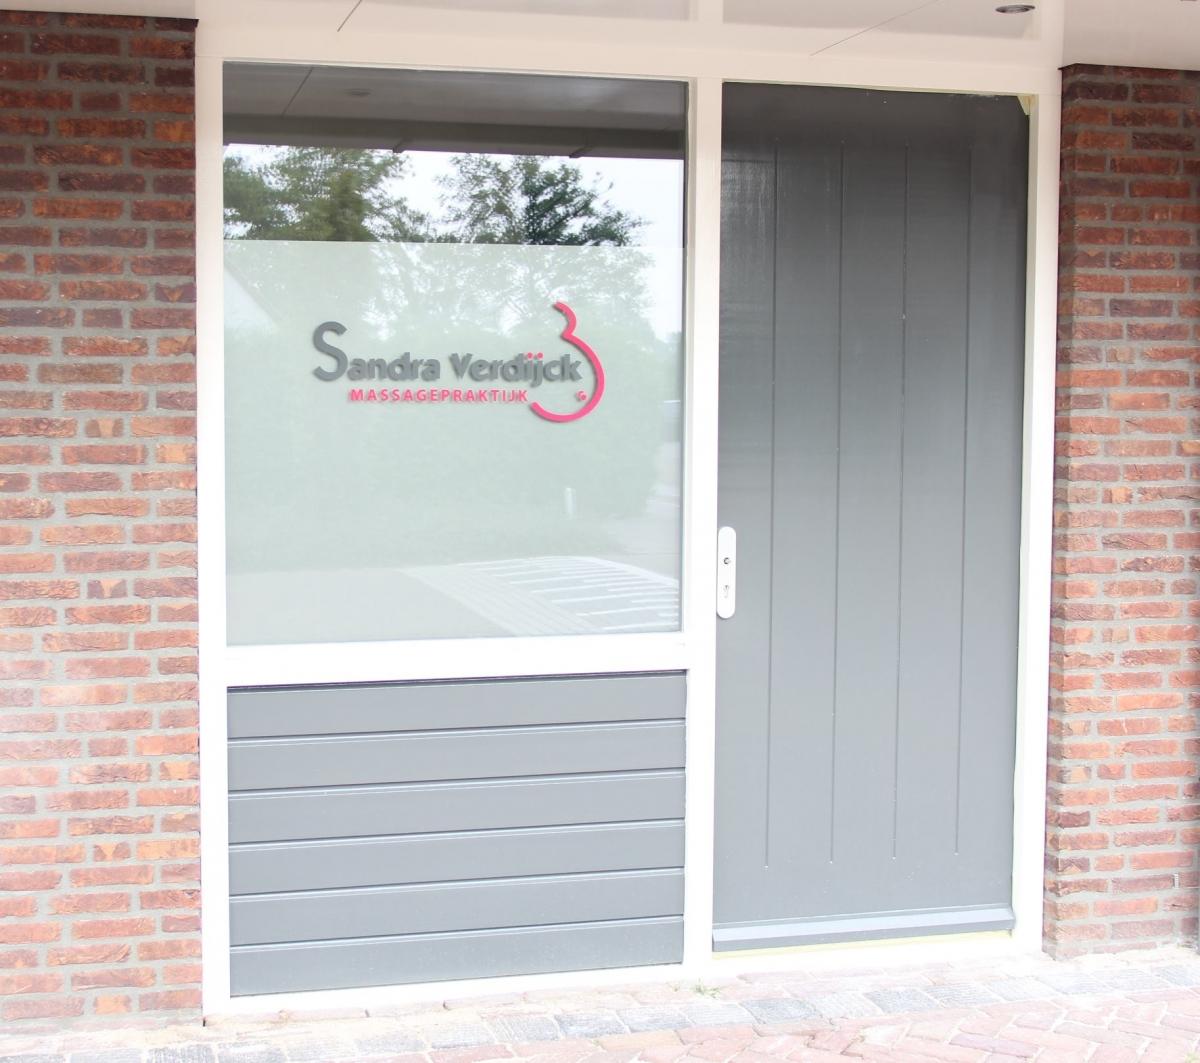 Sandra Verdijck Massagepraktijk - exterieur